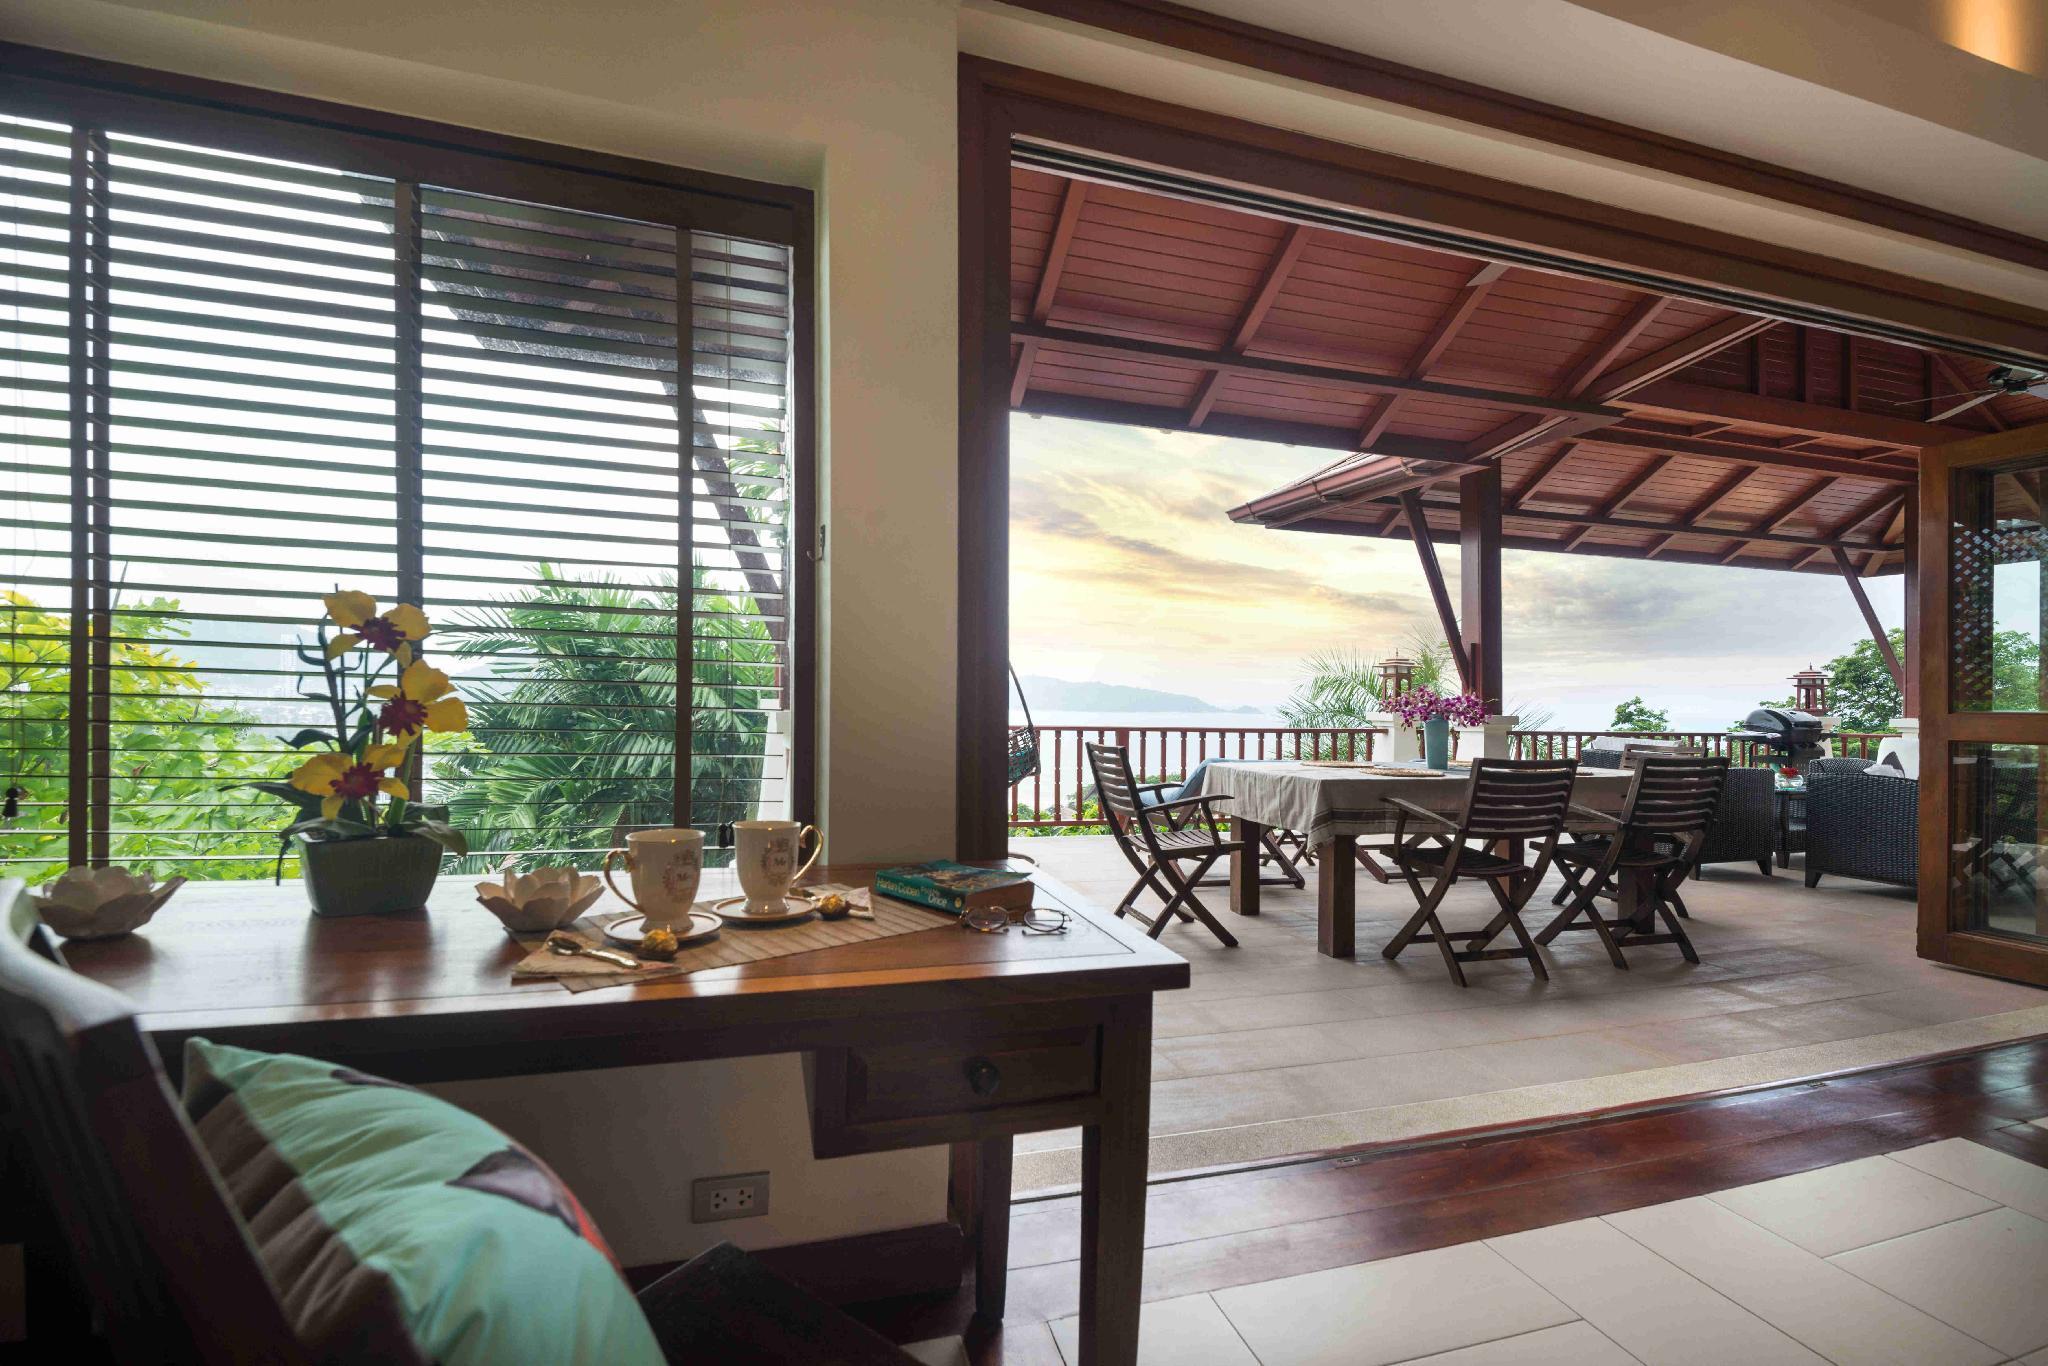 Tom's Sea View Pool Villa/300m to Patong Beach/C10 Tom's Sea View Pool Villa/300m to Patong Beach/C10